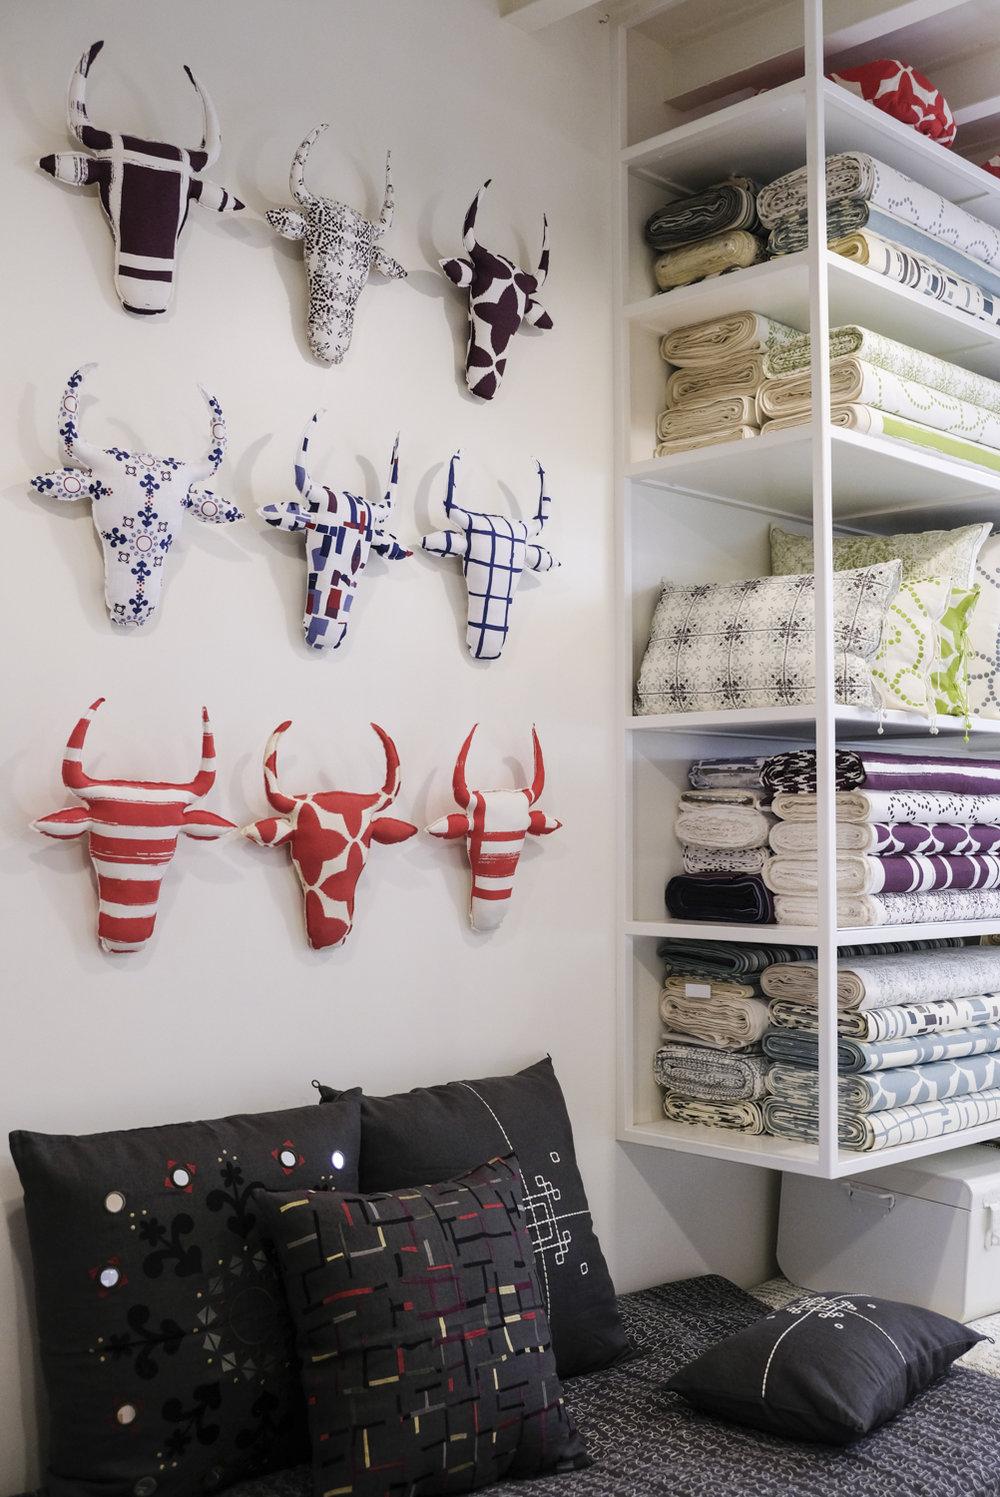 No-Mad fabric shop -5310.jpg